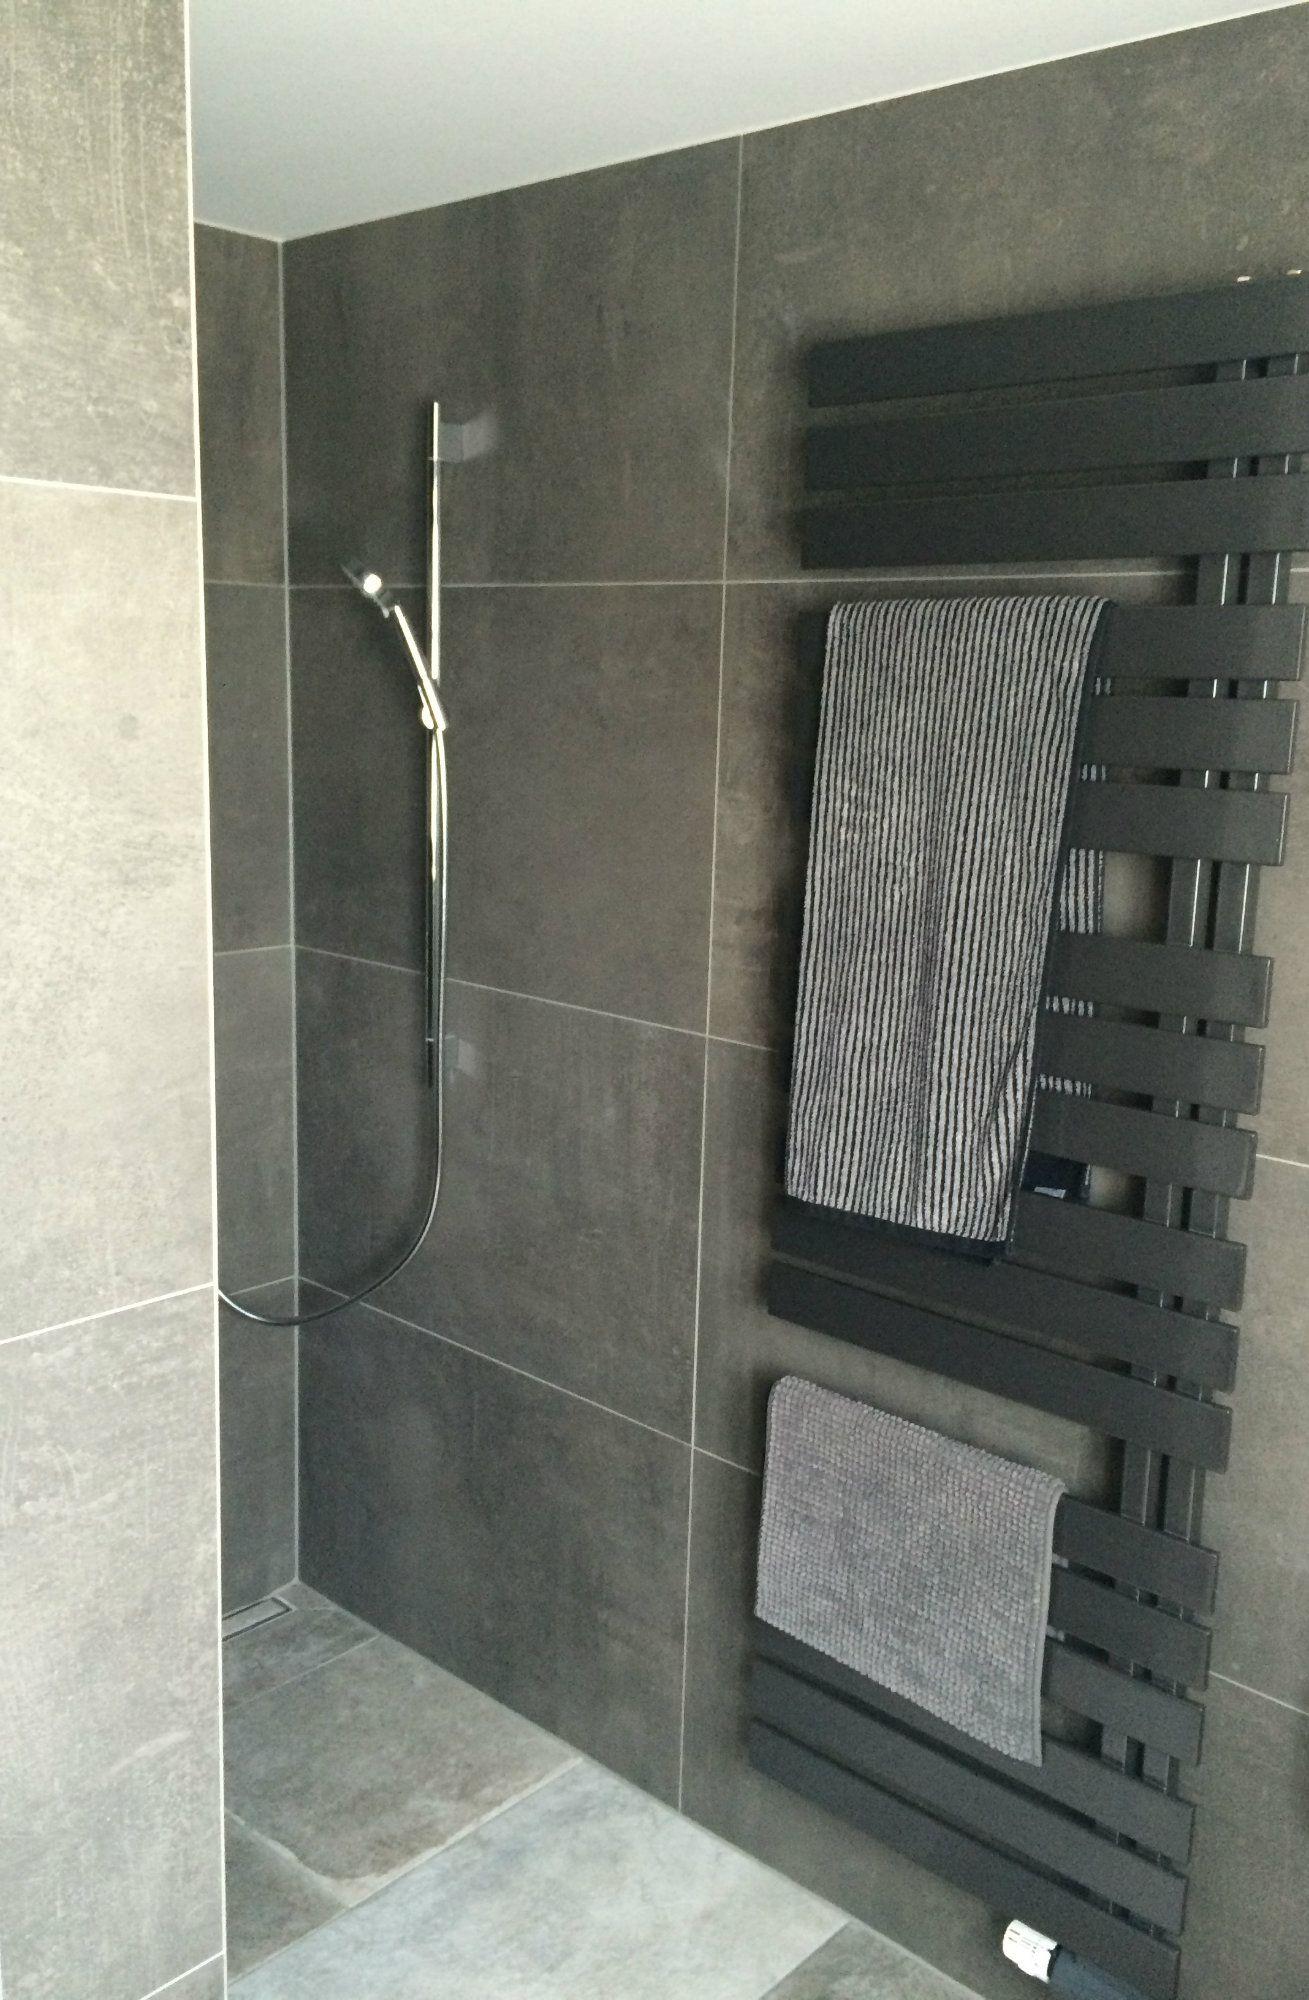 Altersgerechtes Duschbad Badezimmer Dekor Badezimmerideen Walk In Dusche